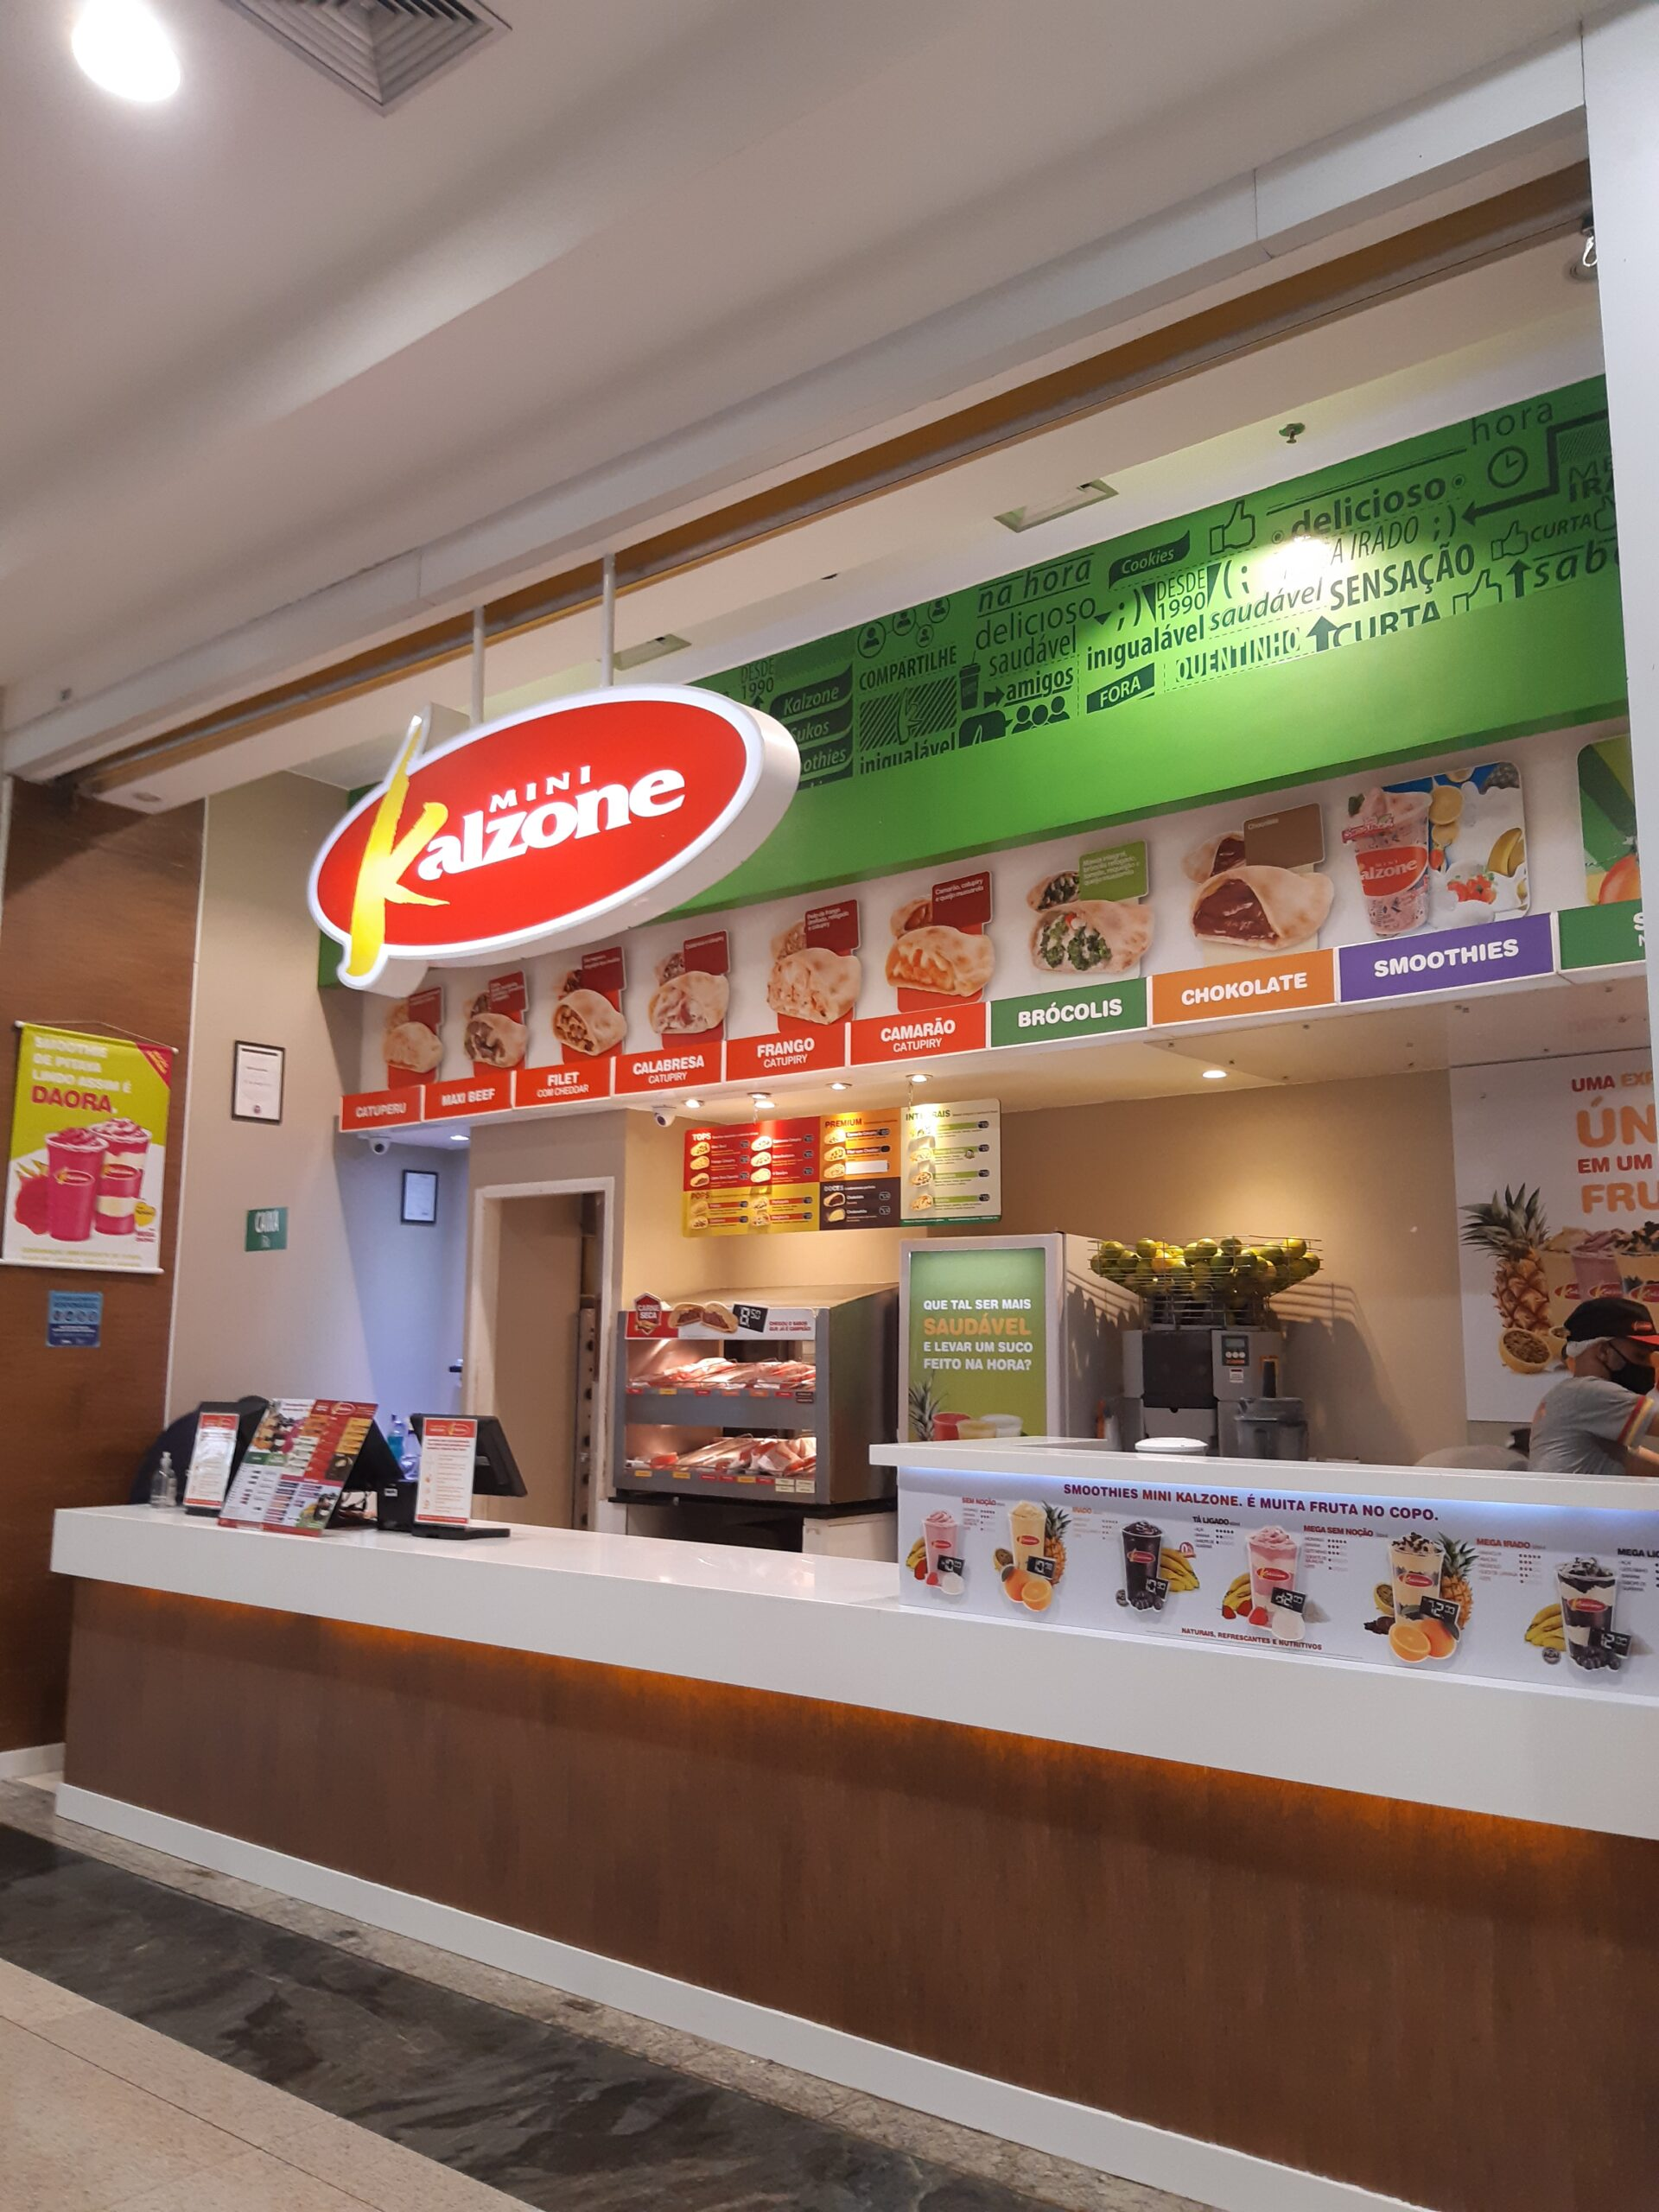 kalzone do Taguatinga Shopping, Comércio Brasilia